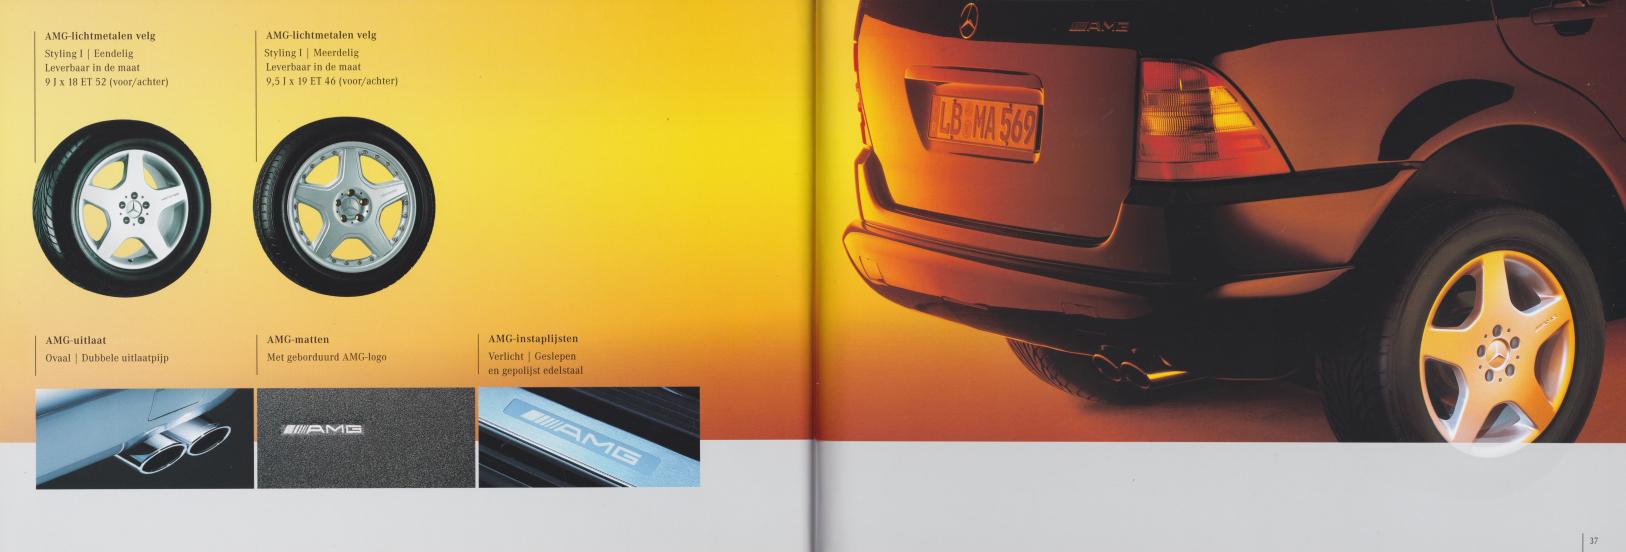 (W163): Catálogo 2001 - acessórios - neerlandês 019